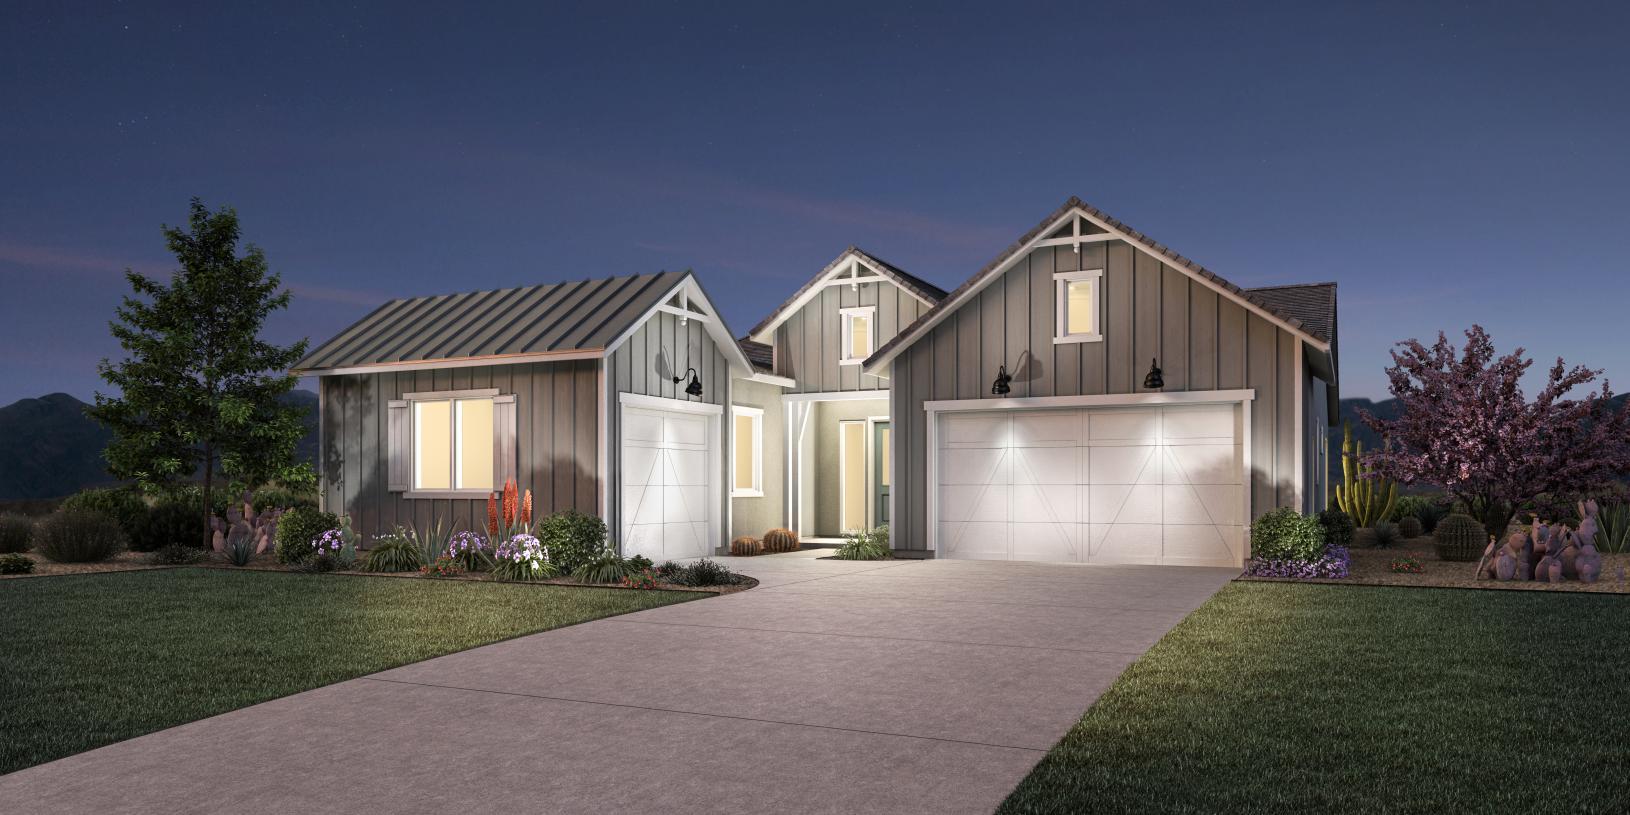 Sheldon - Farmhouse